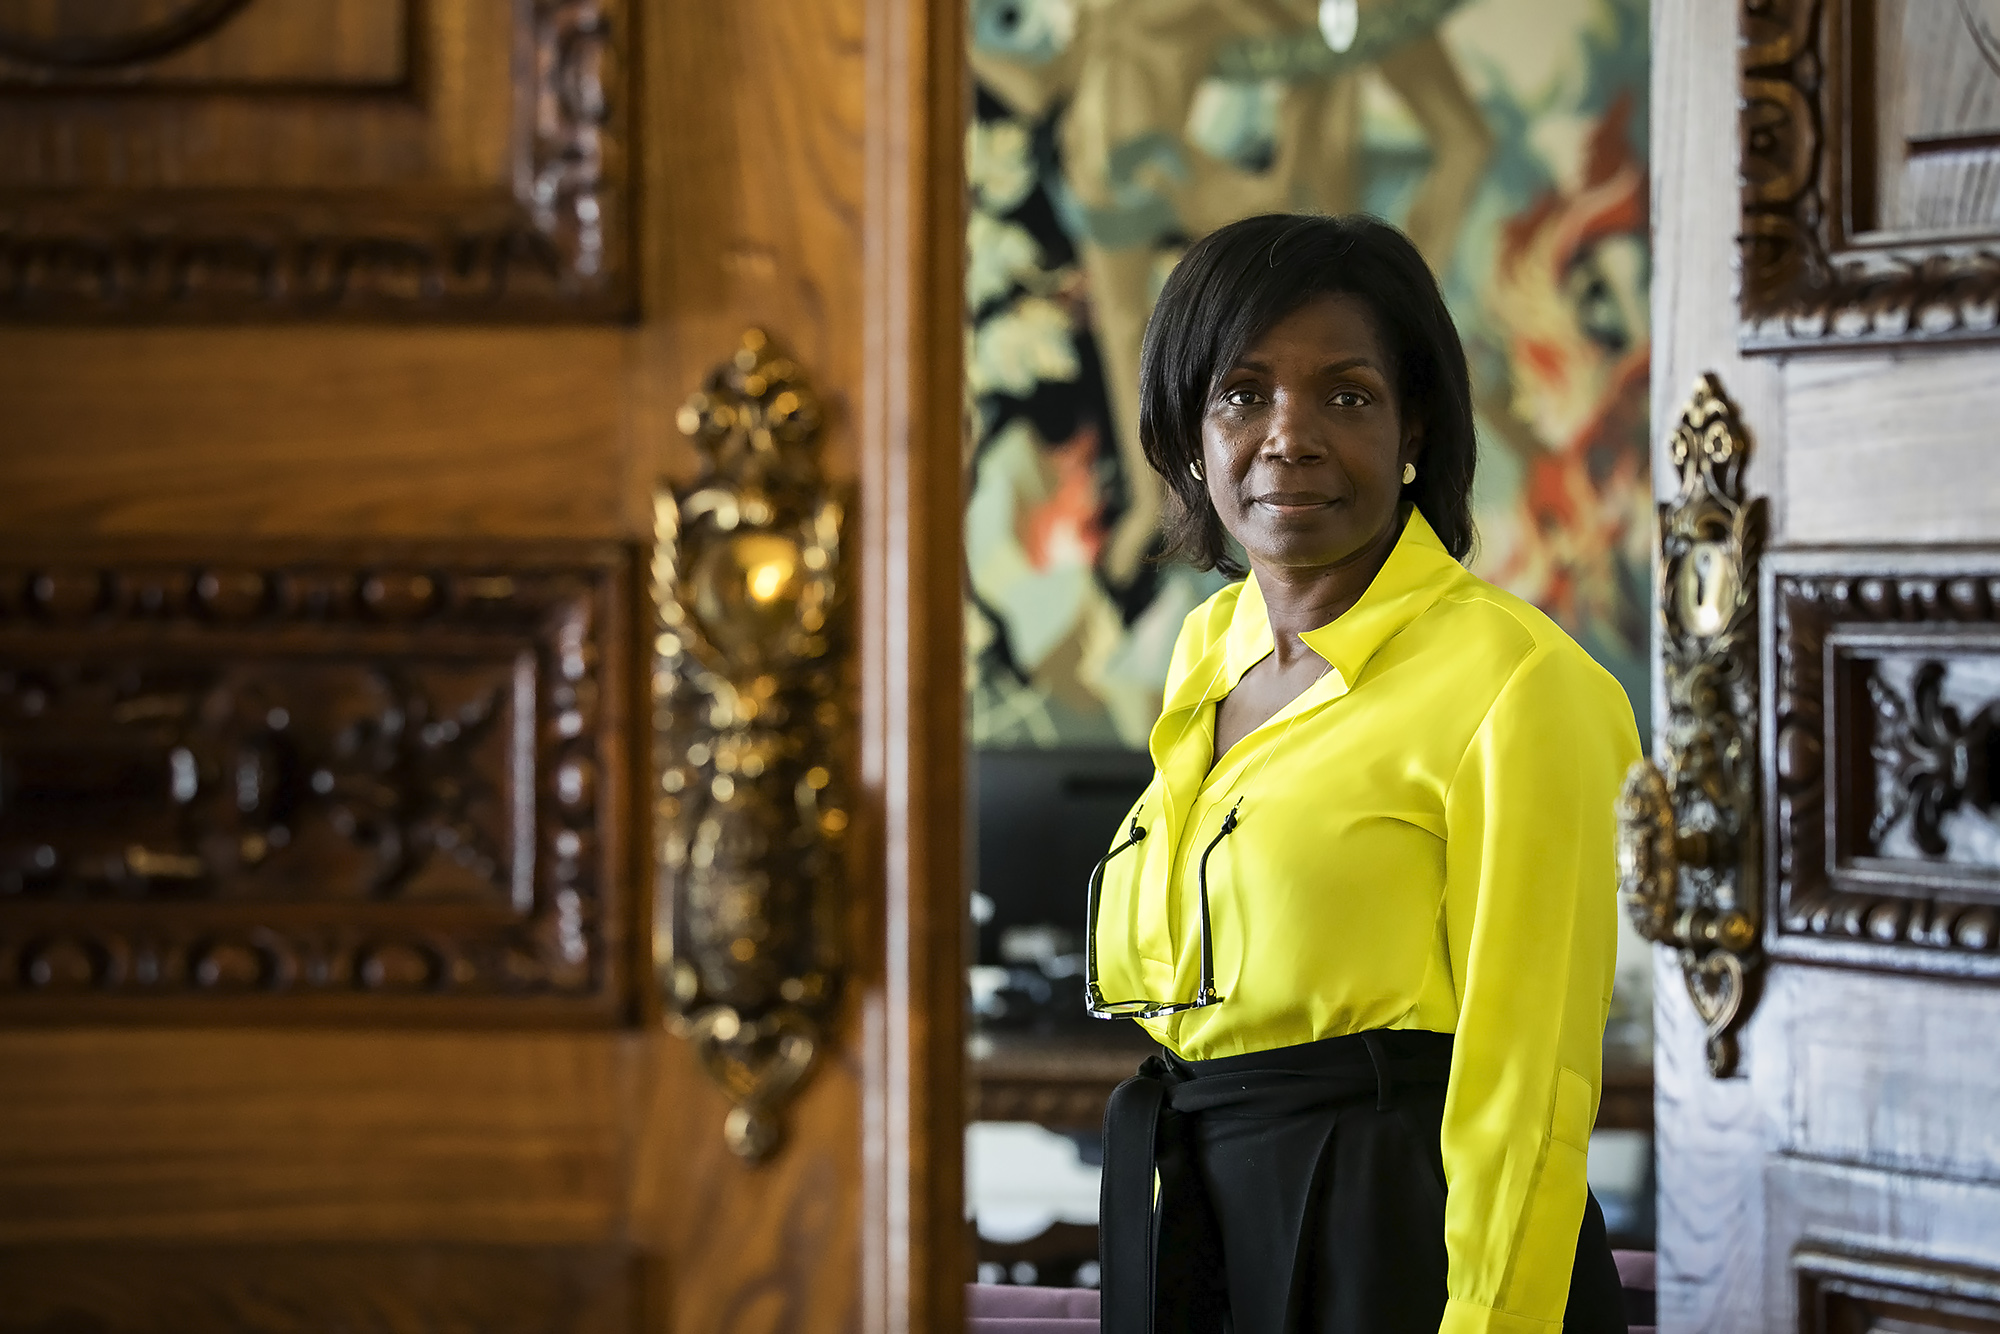 A Ministra da Justiça, Francisca Van Dunem, em entrevista ao ECO/Advocatus - 08SET20